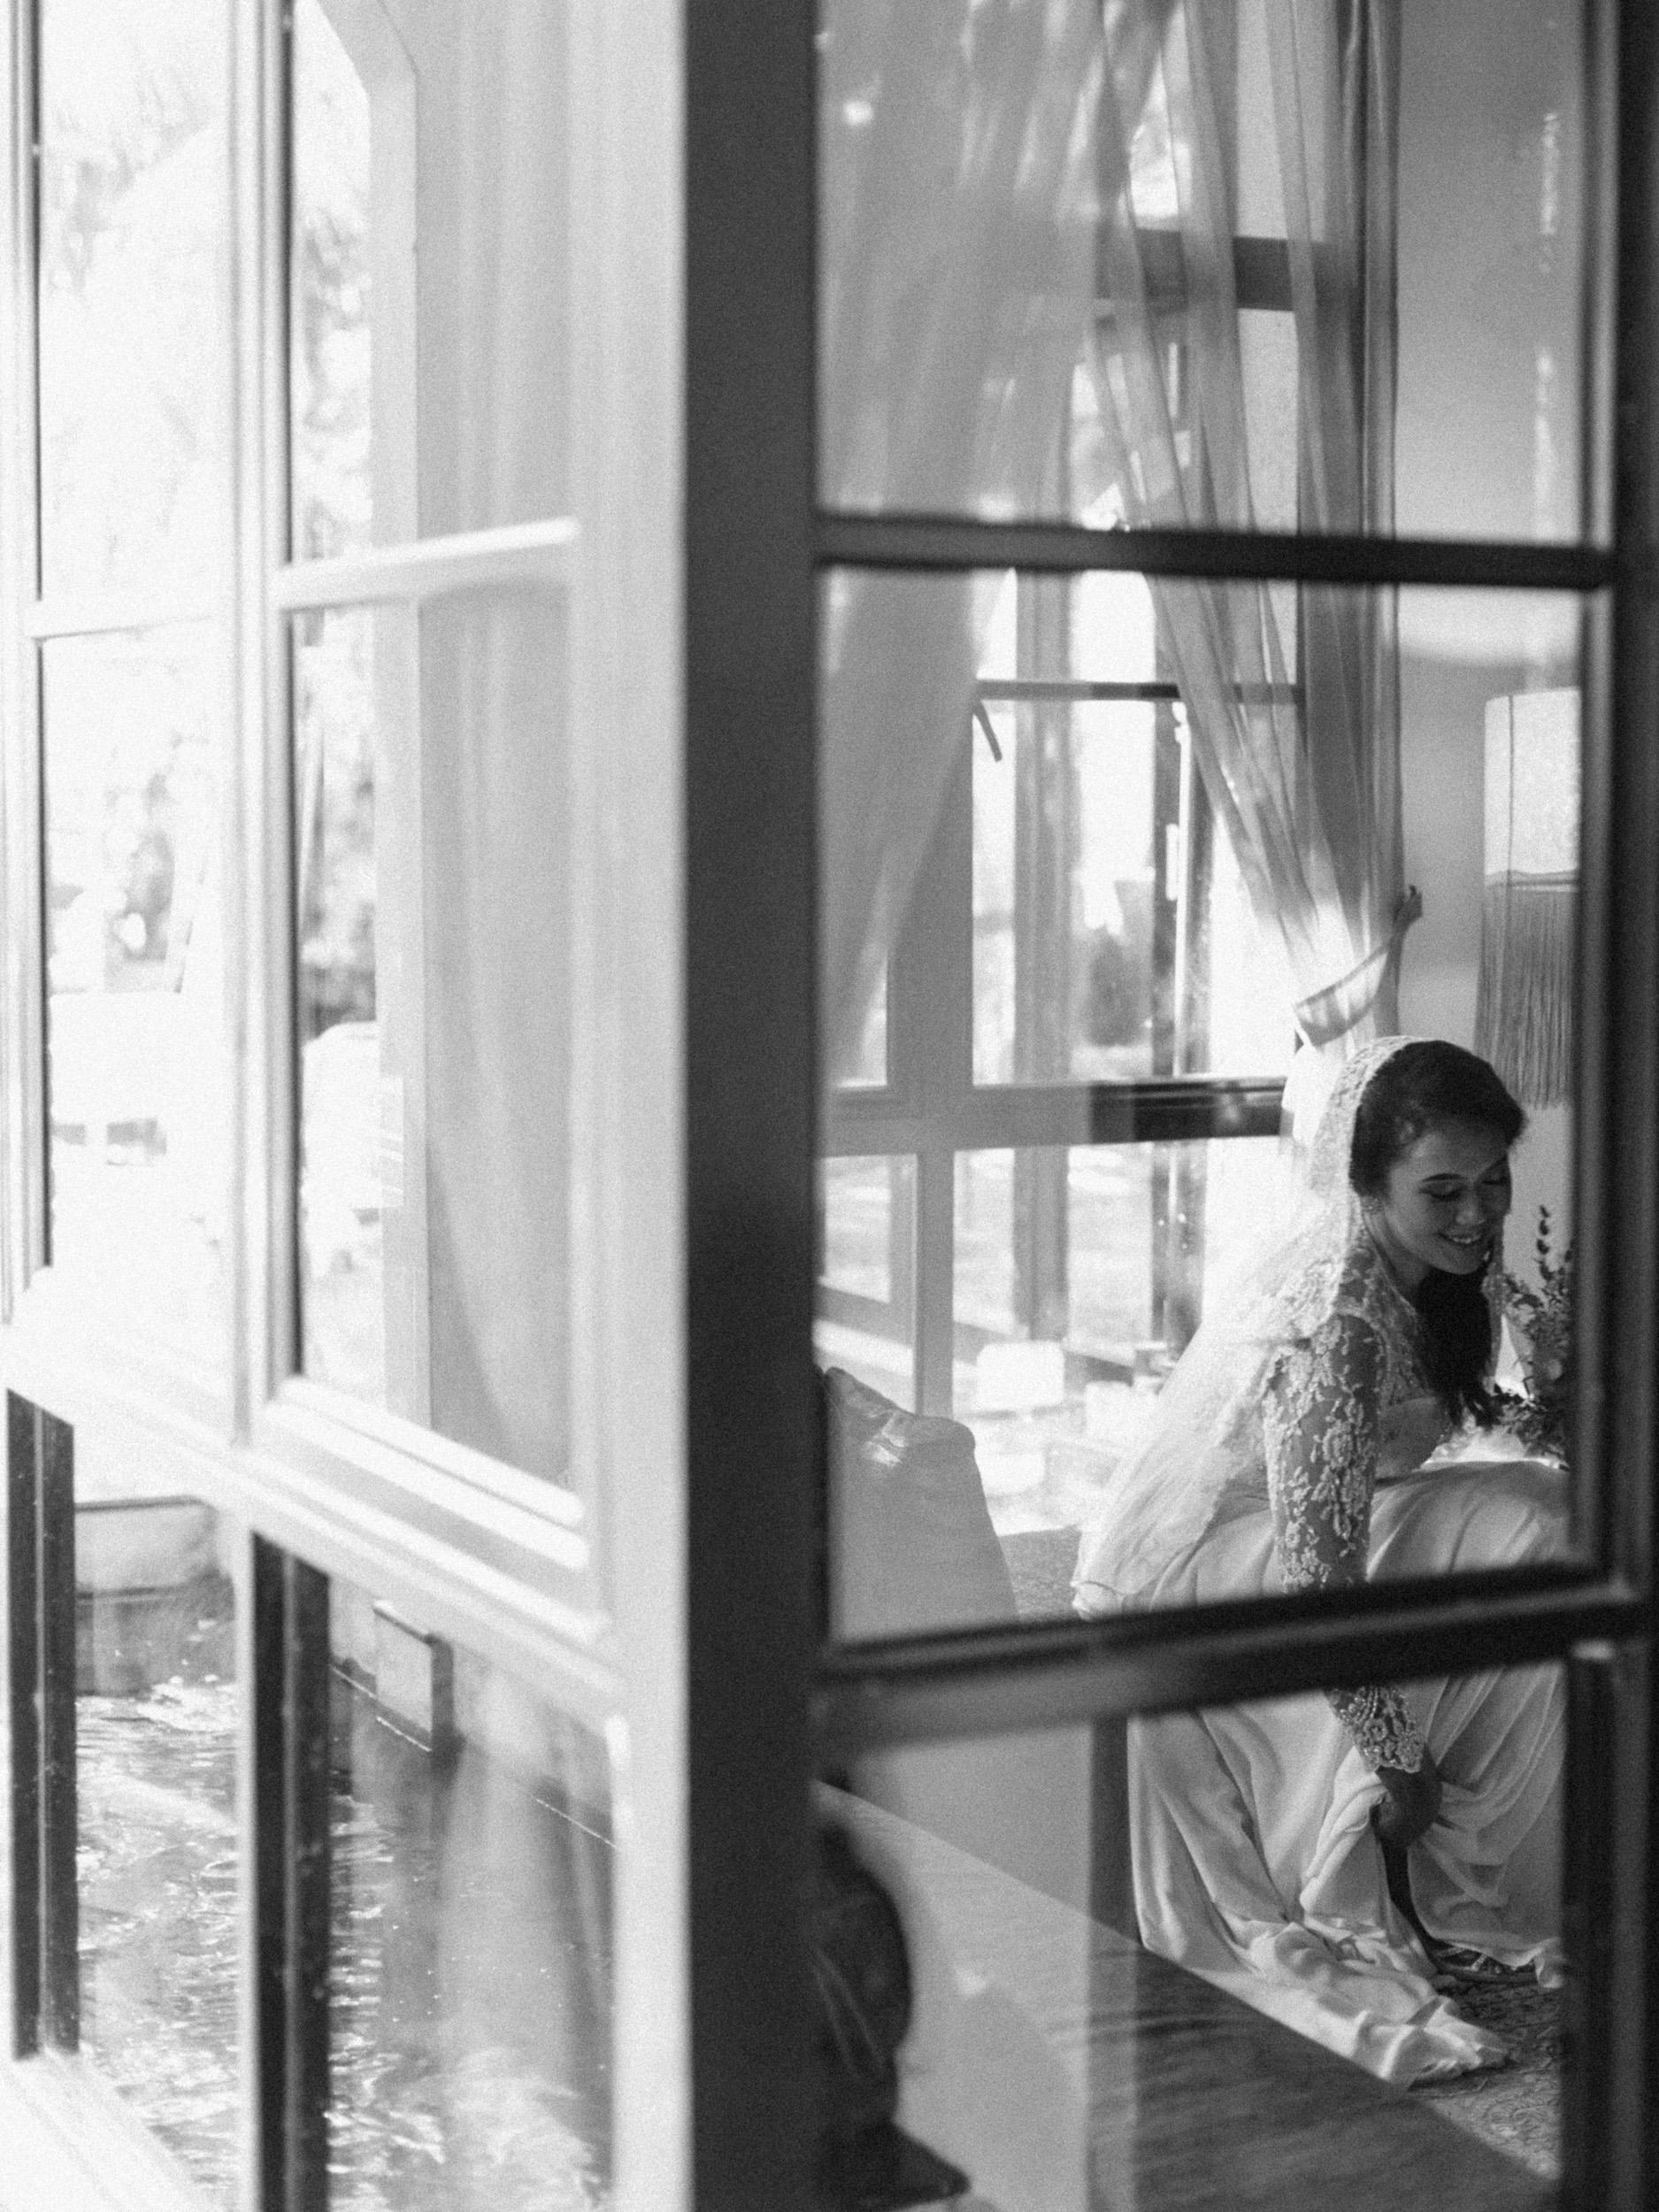 singapore-wedding-photographer-photography-wmt2017-003.jpg